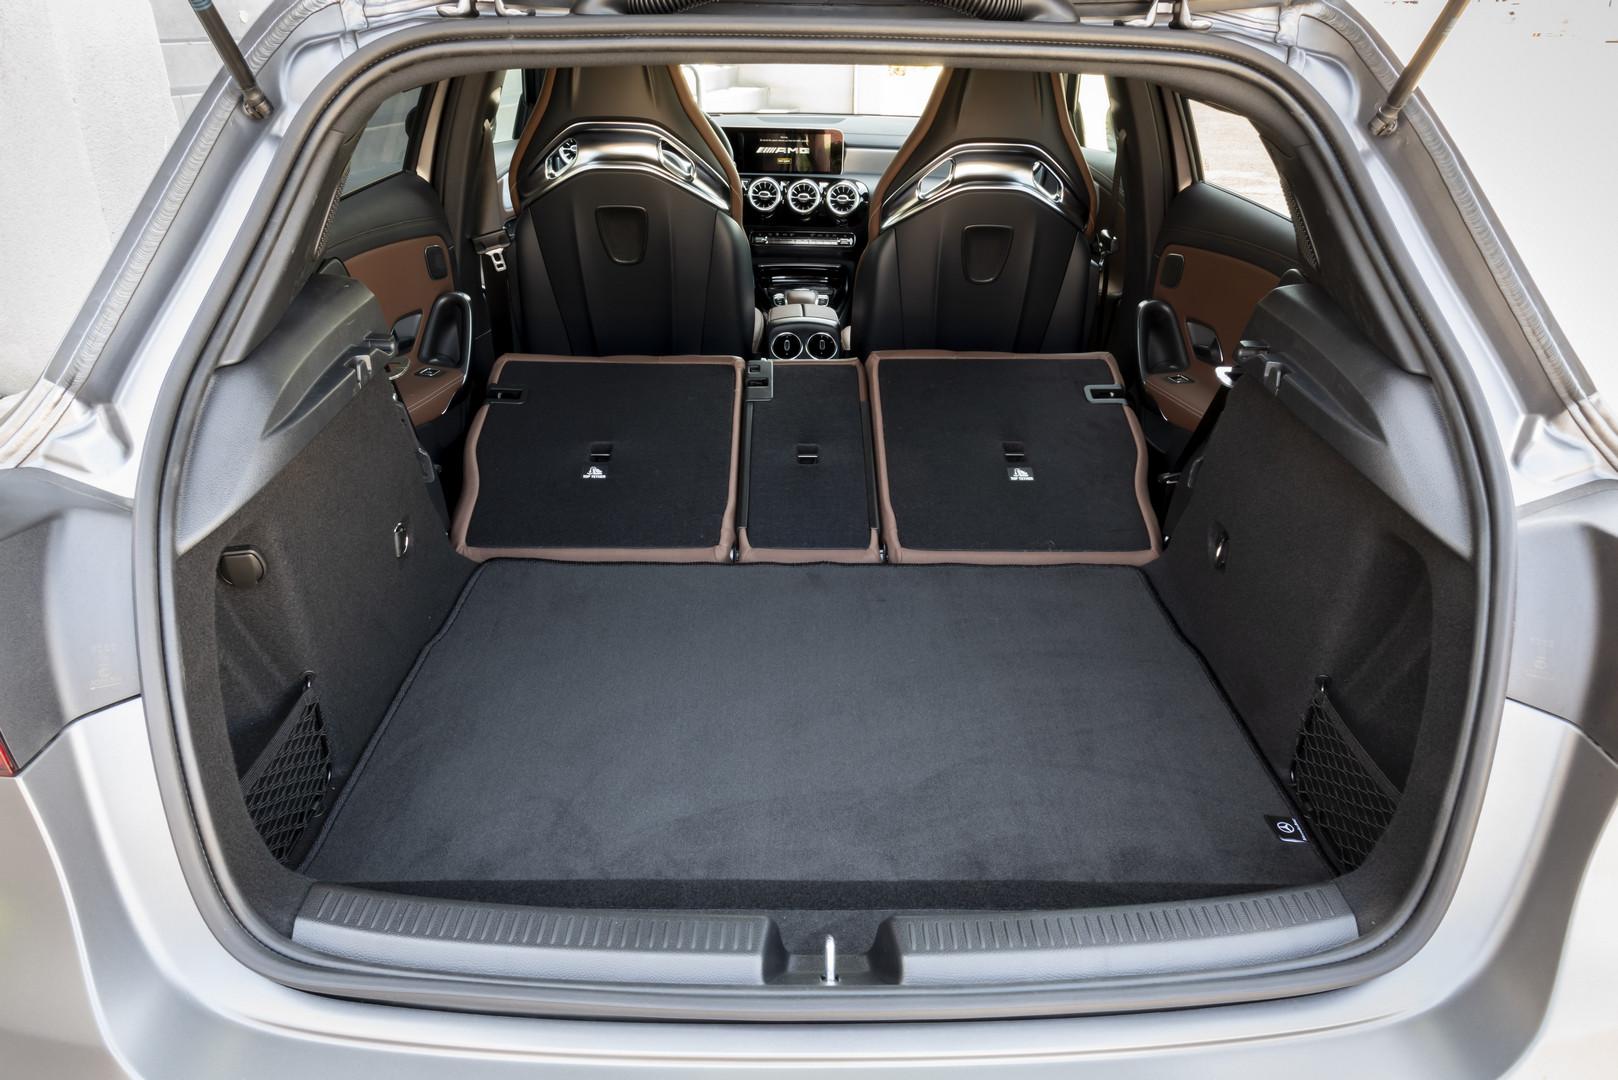 Mercedes-AMG A45 S Trunk